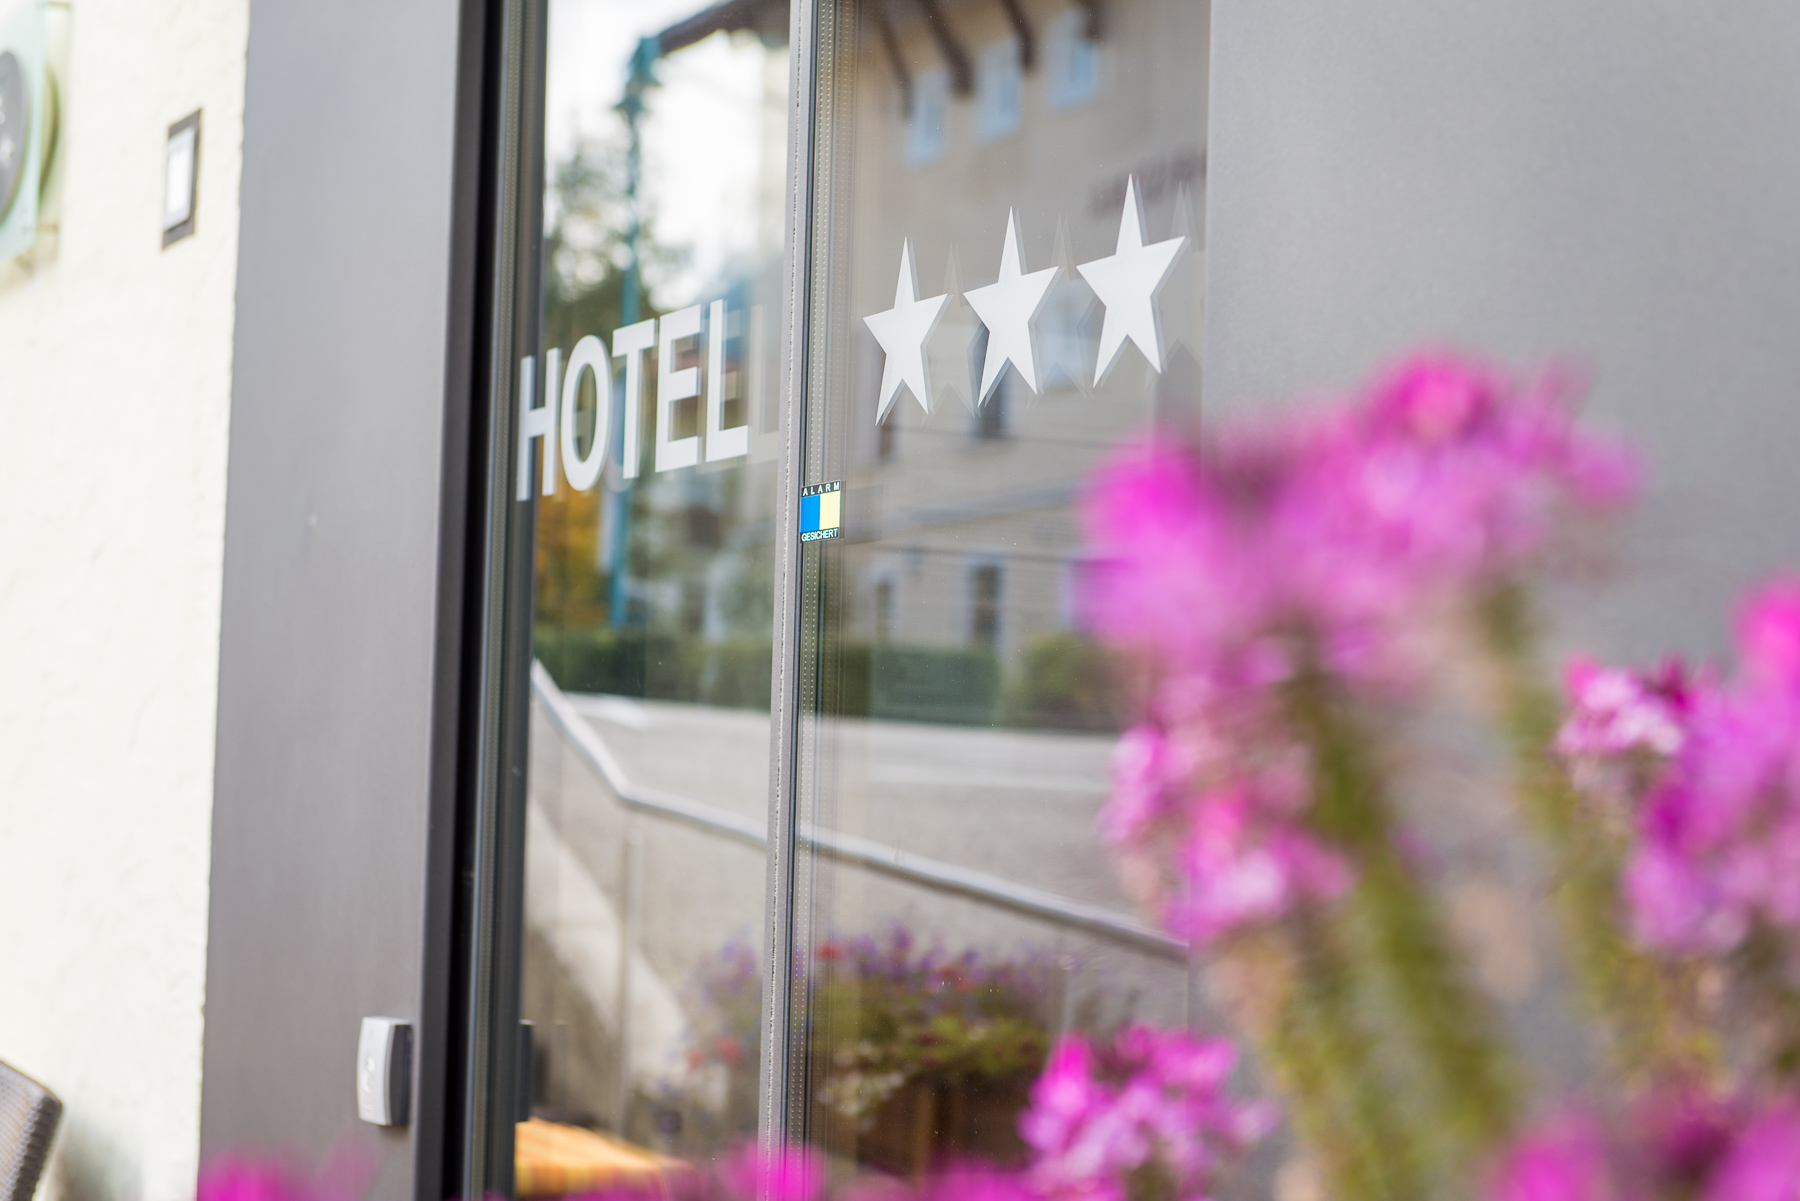 Impressioni a Dobbiaco   Hotel Nocker   Val Pusteria   Tre ...